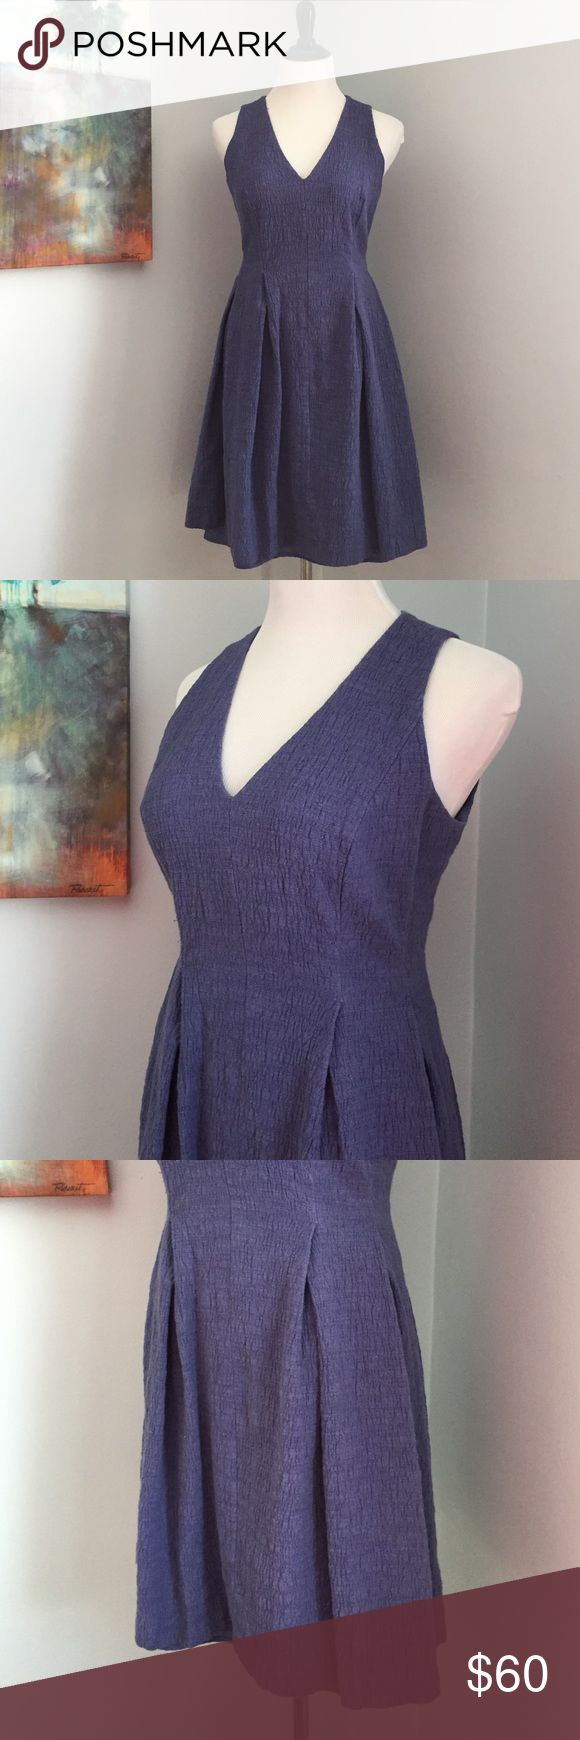 Ann Taylor LOFT Dress Pretty, dark periwinkle textured Ann Taylor LOFT dress. Fully lined, worn once. Half zip back closure. Perfect for work or out! LOFT Dresses